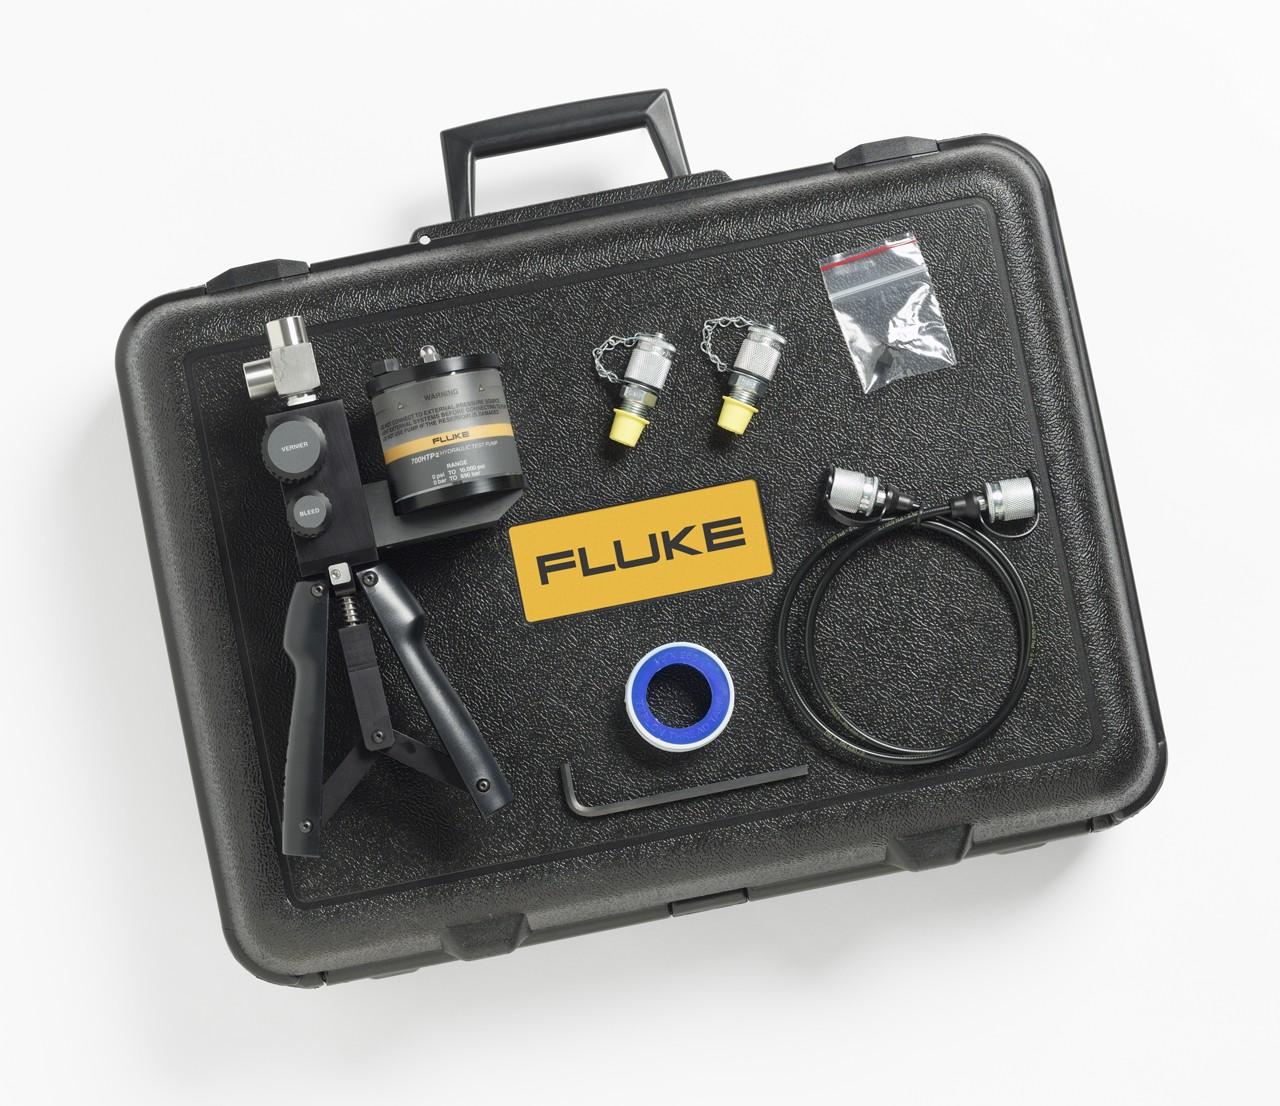 Hydraulic Test Pump Kit 0 To 10000 Psi 700 Bar